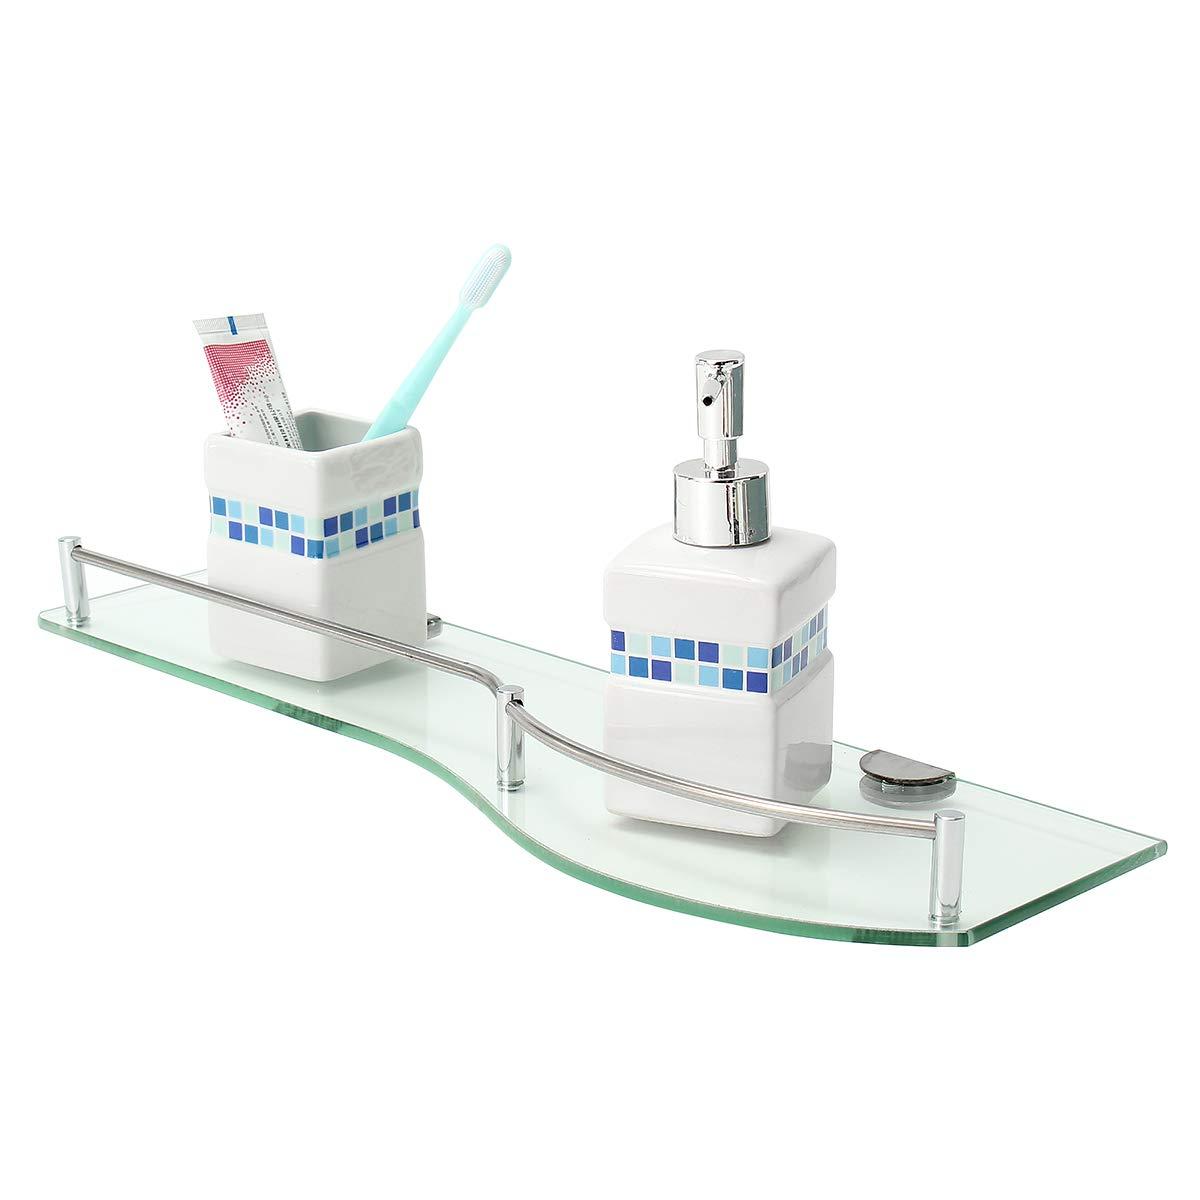 MJJEsports Cuarto De Baño Vidrio Ducha Esquina Estante Rectángulo Nivel Estante Soporte Montaje En Pared